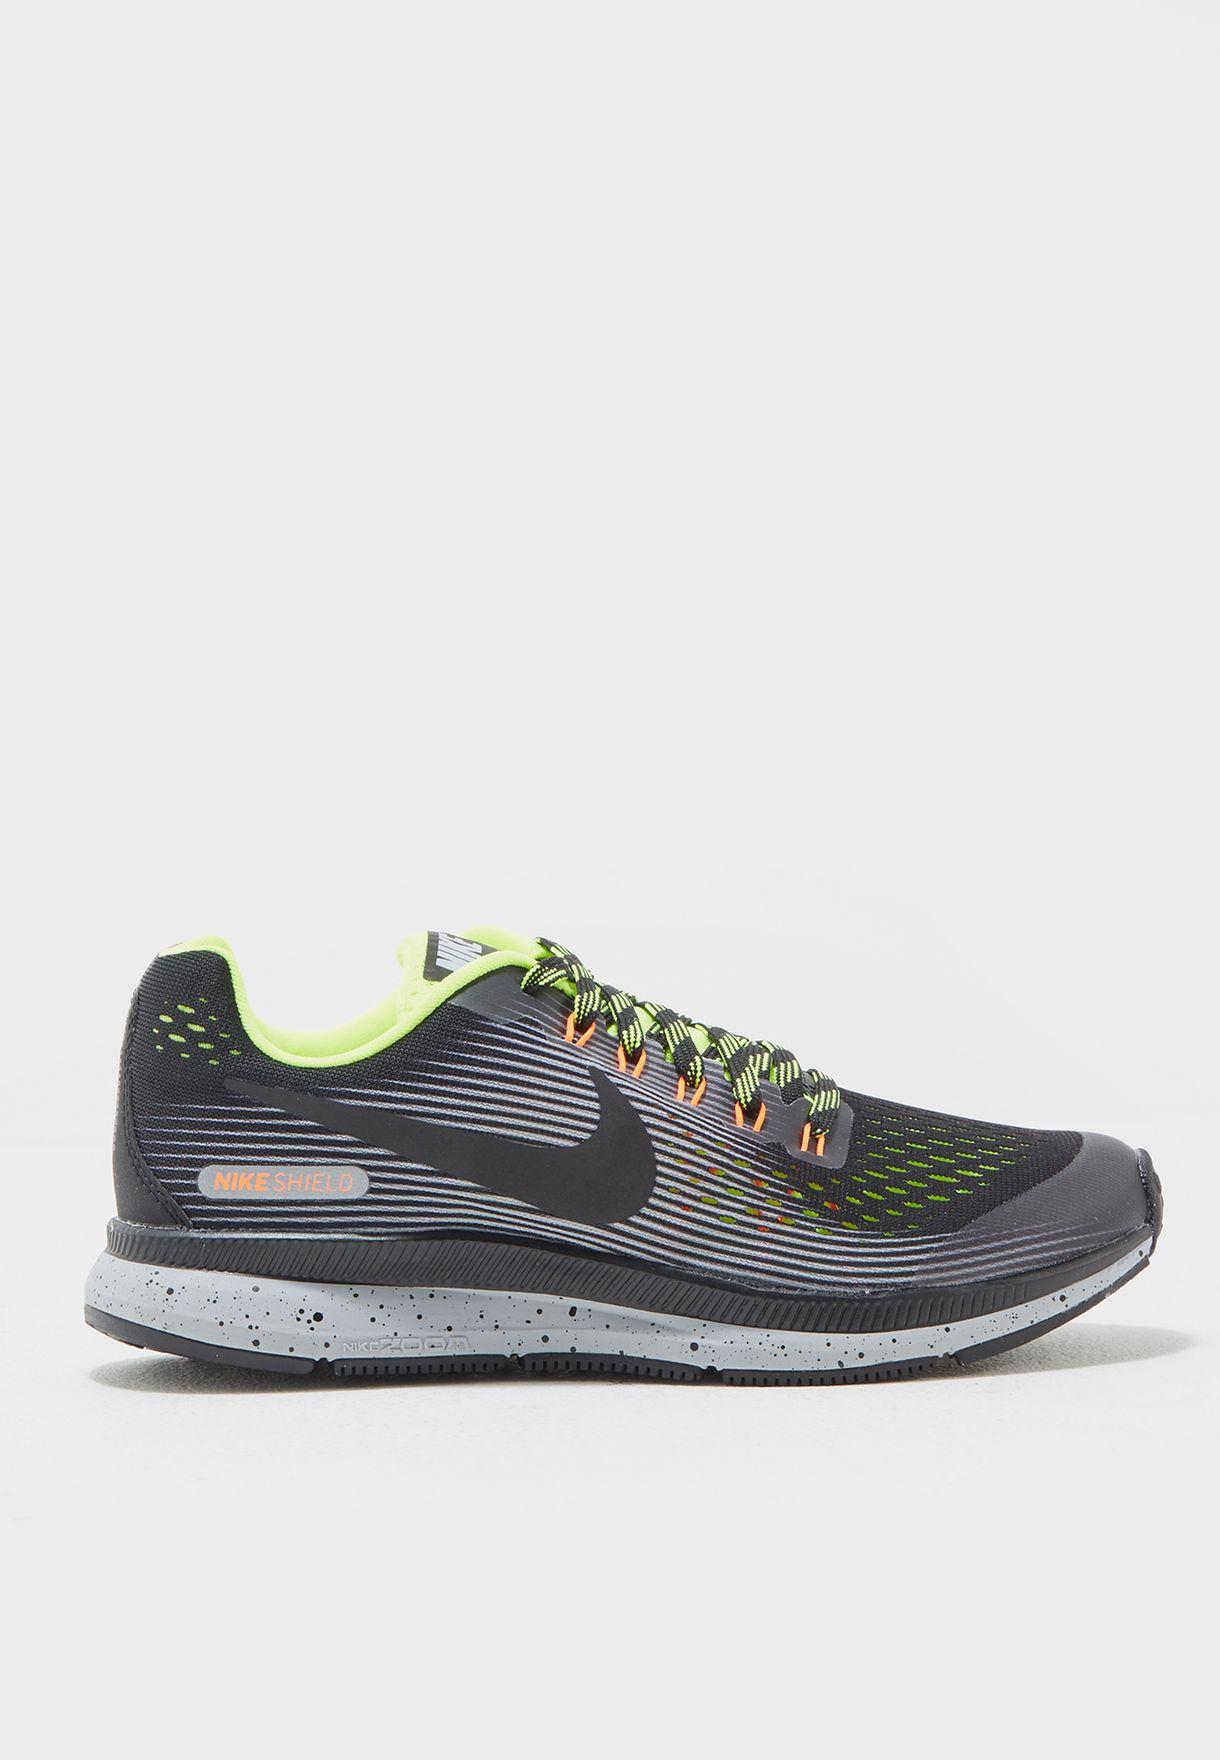 e02e5651052f Shop Nike multicolor Zoom Pegasus 34 Shield Youth 922850-001 for ...